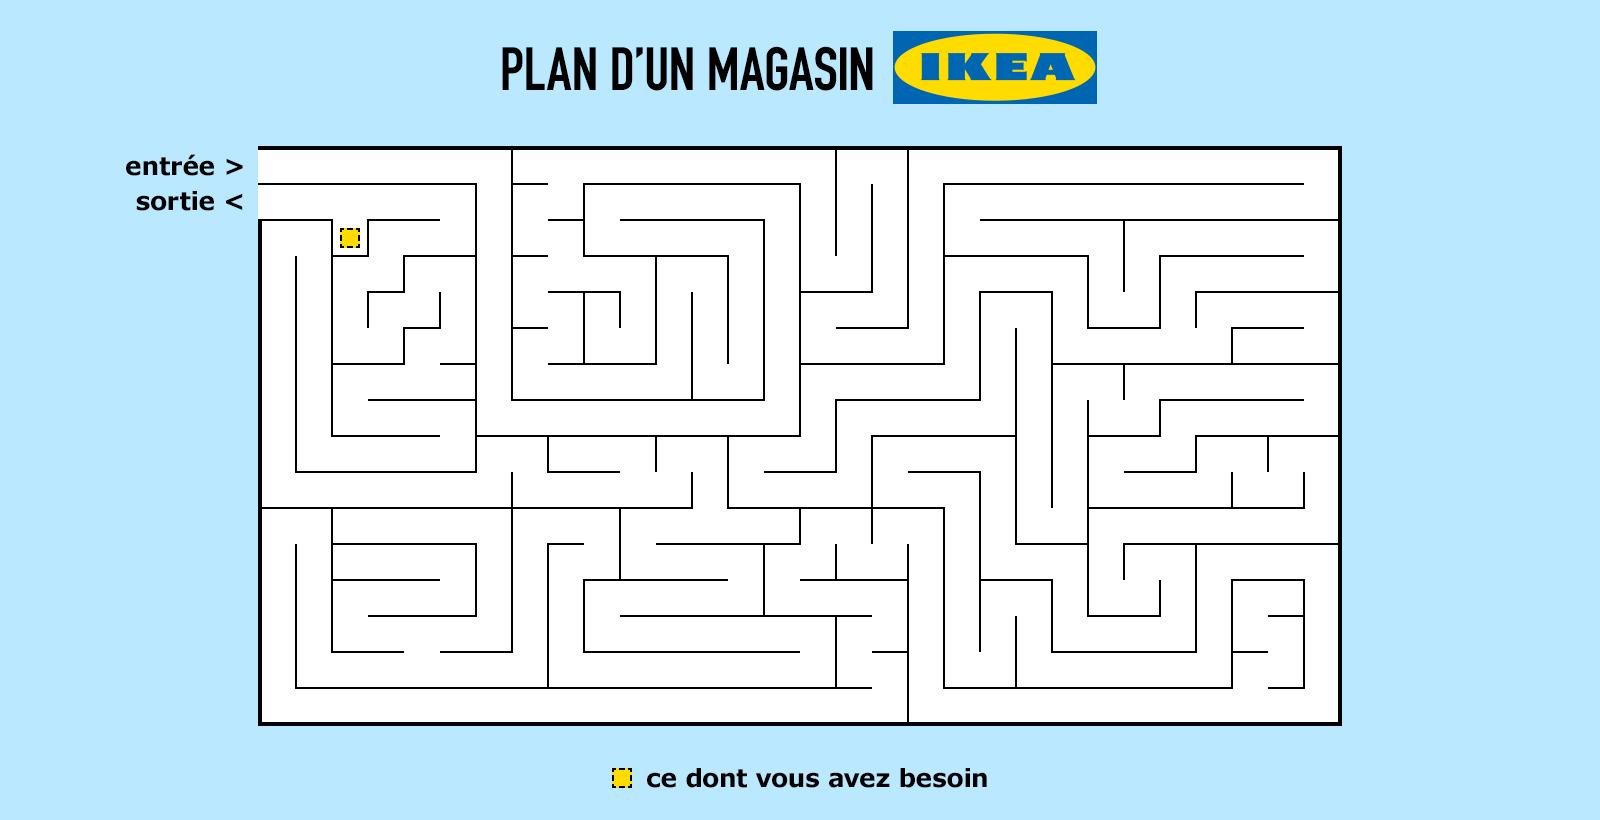 Le plan d'un magasin IKEA selon Kind of Normal.